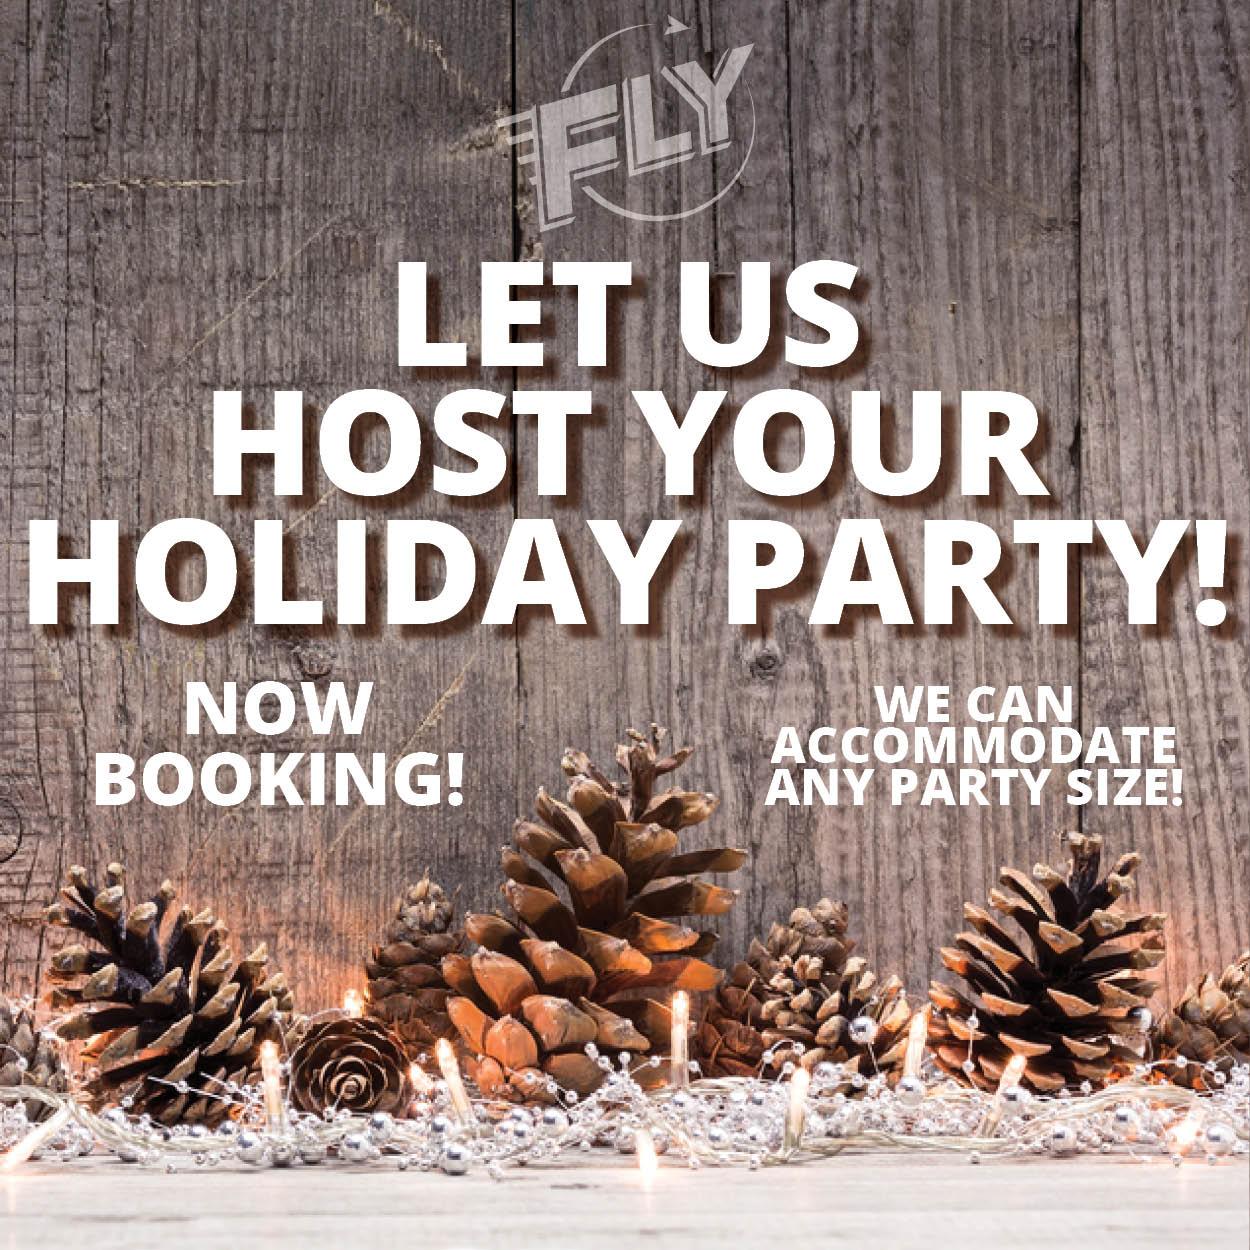 FLY-holidaypartiesSQ